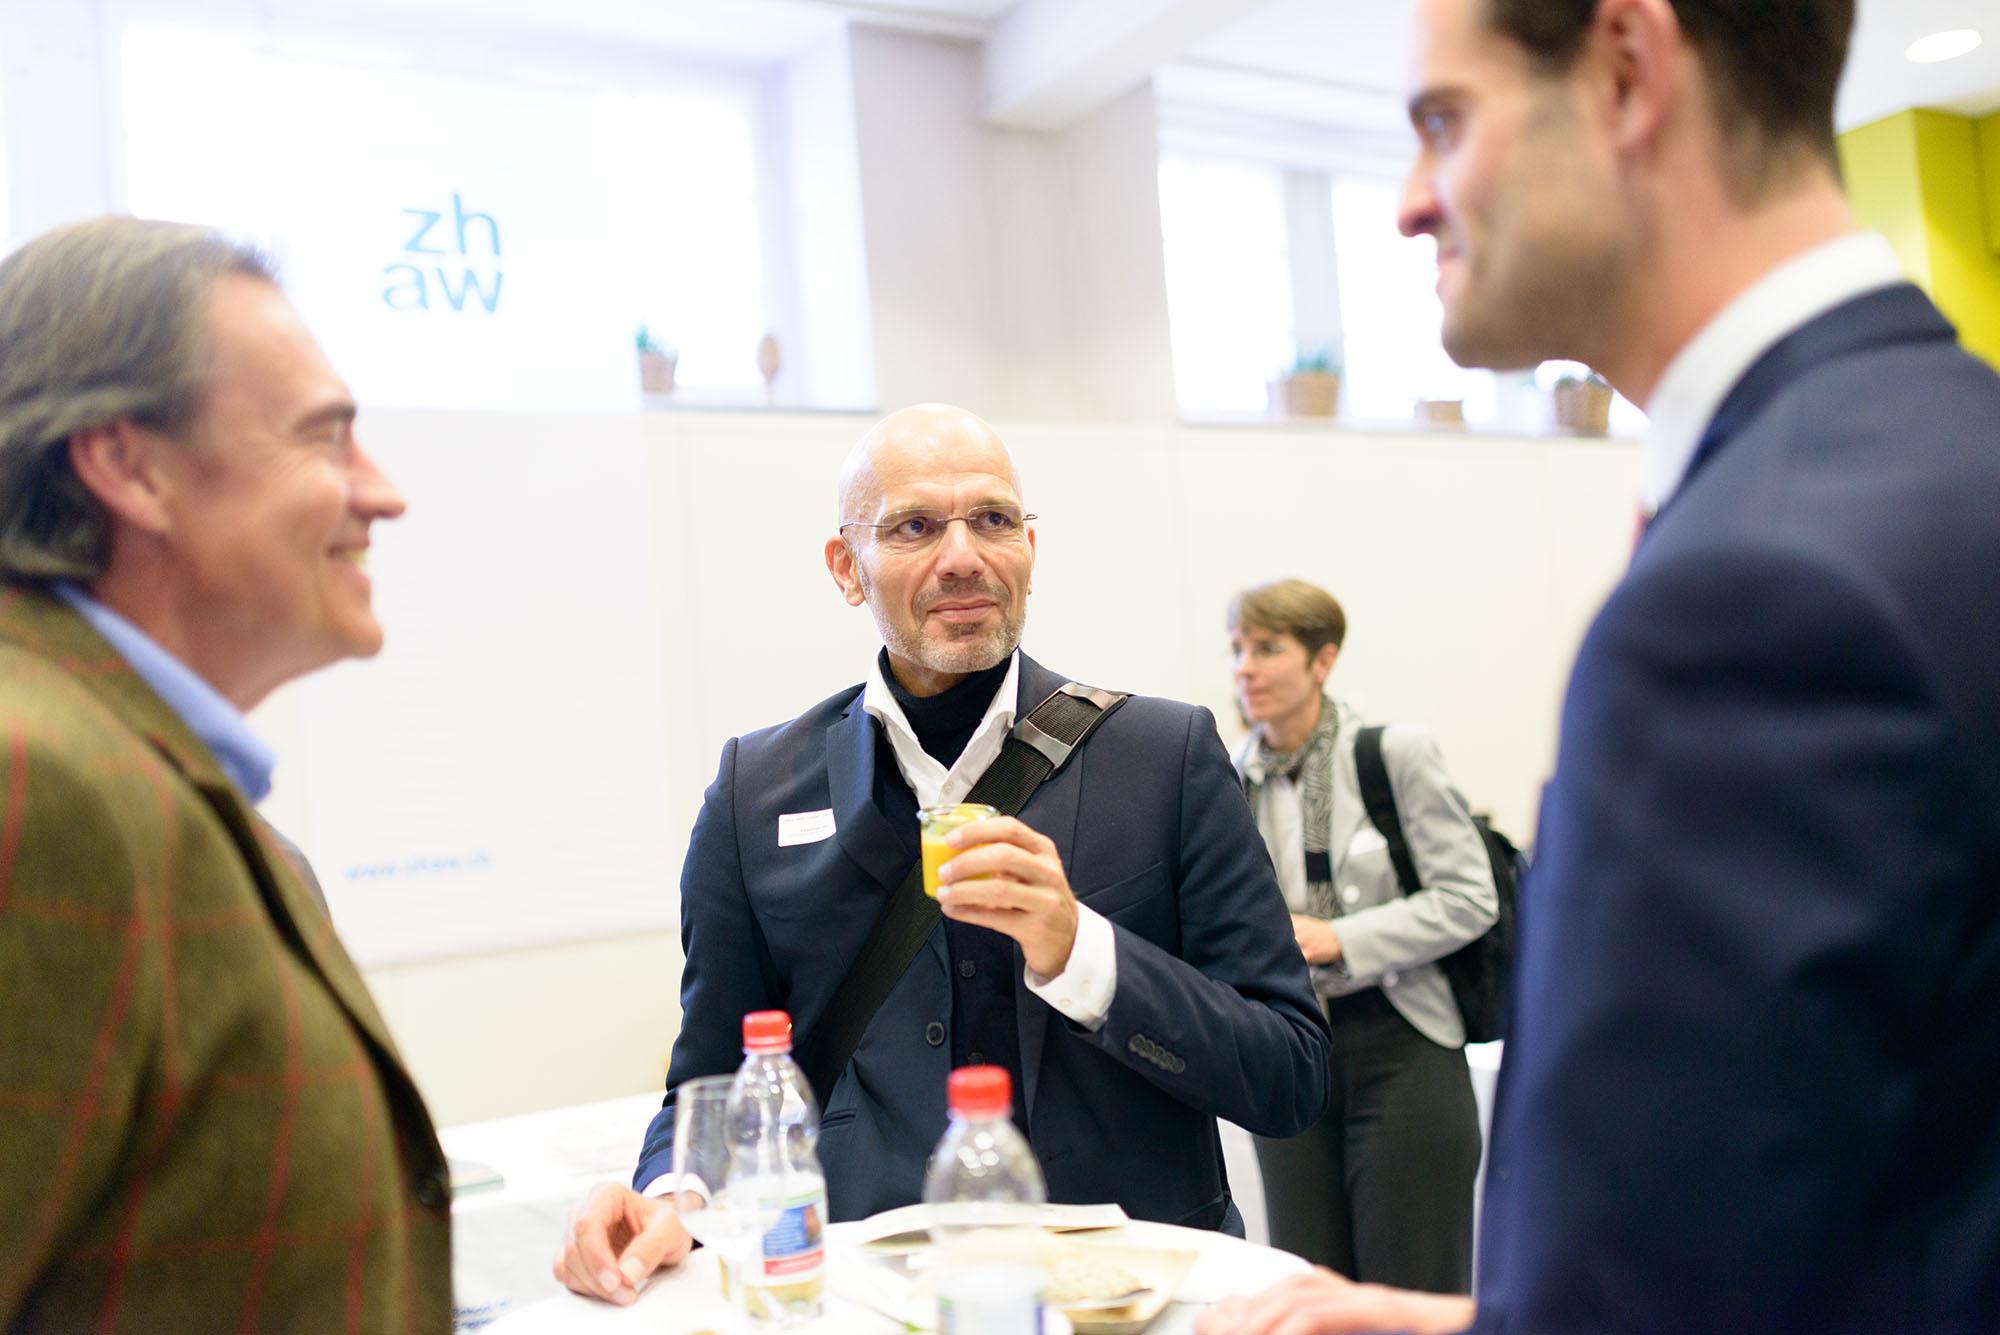 Max Schachinger, Vorsitzender des Beirats, Schachinger Logistik Holding GmbH